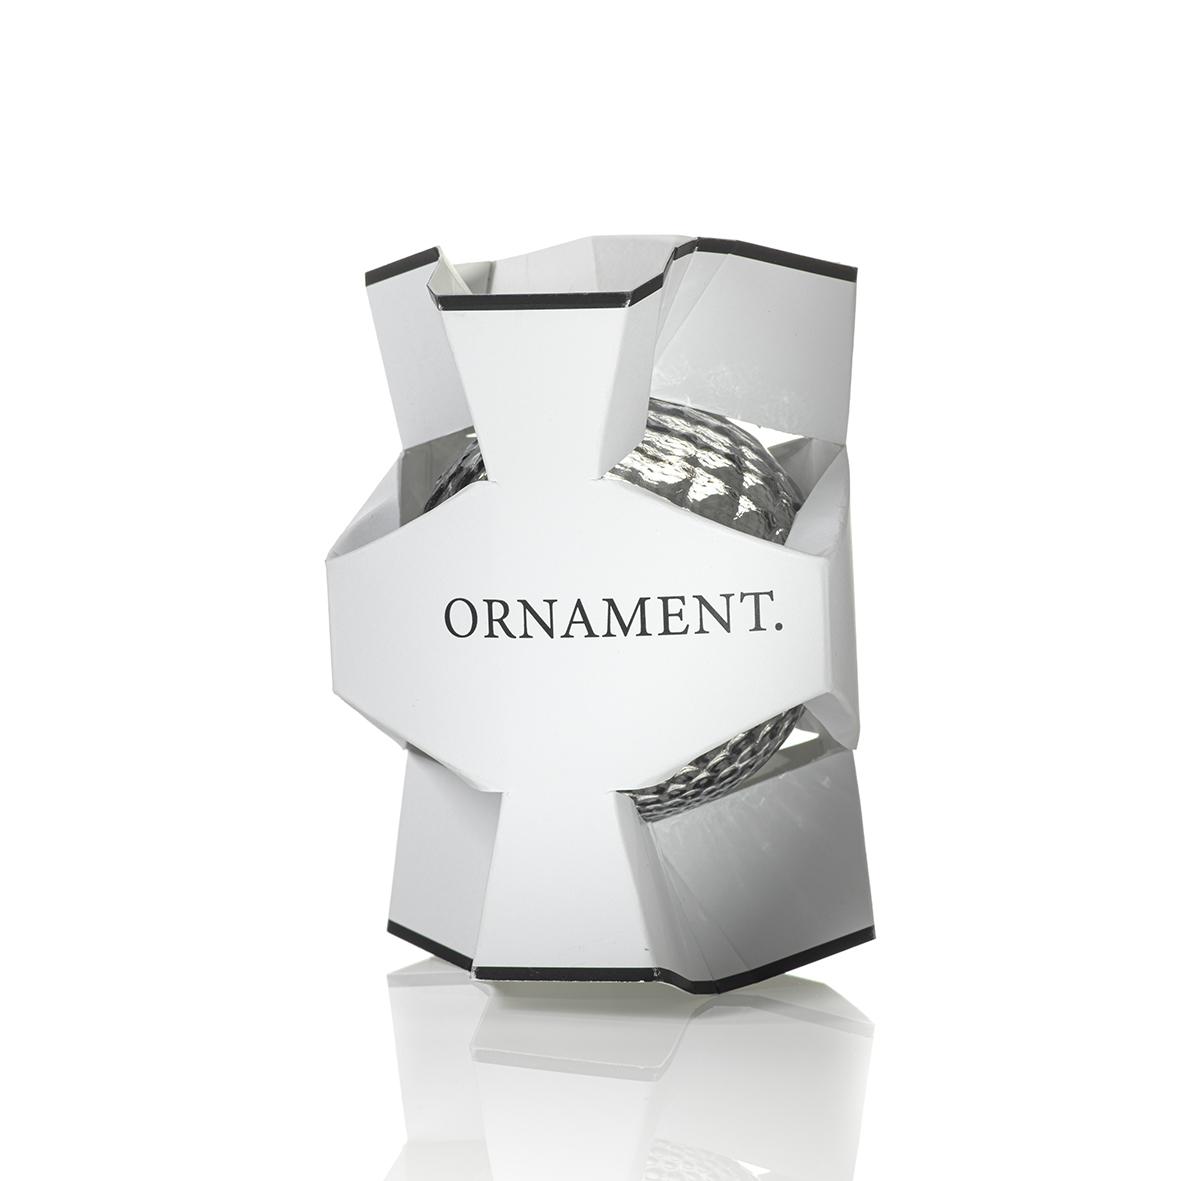 carton-award-image 233306